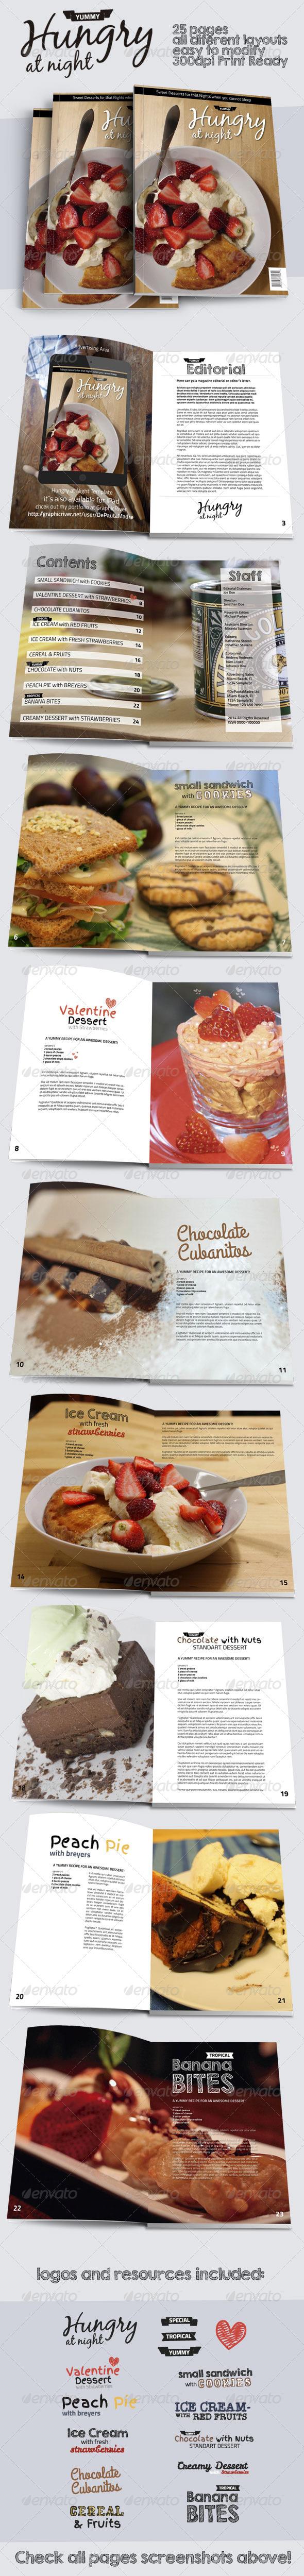 Hungry At Night Print Magazine Template - Magazines Print Templates